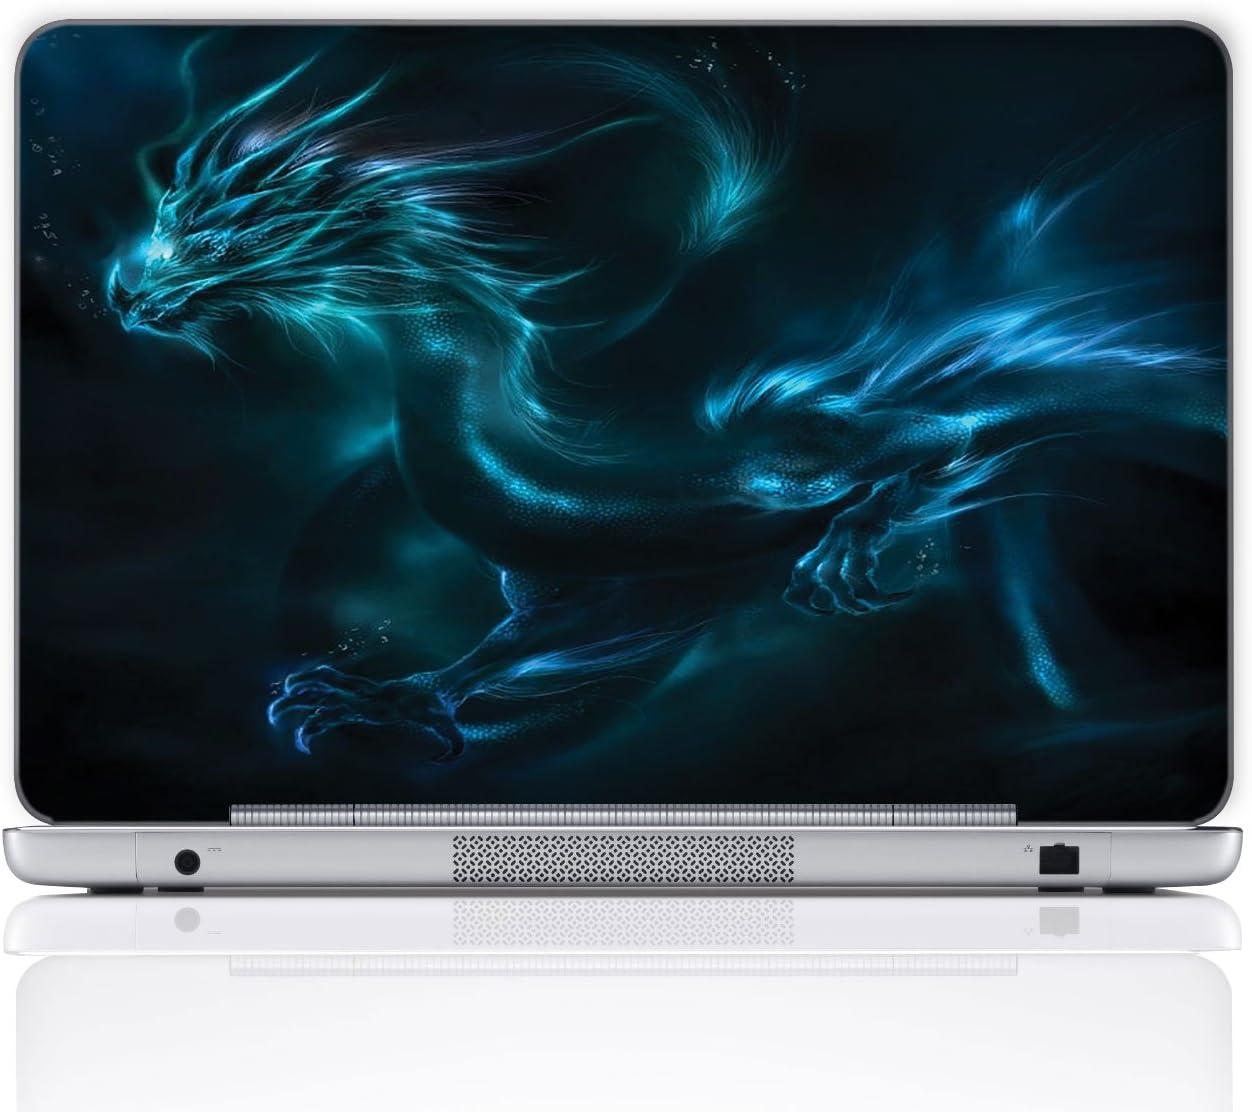 Meffort Inc 15 15.6 Inch Laptop Notebook Skin Sticker Cover Art Decal (Free Wrist pad) - Blue Dragon